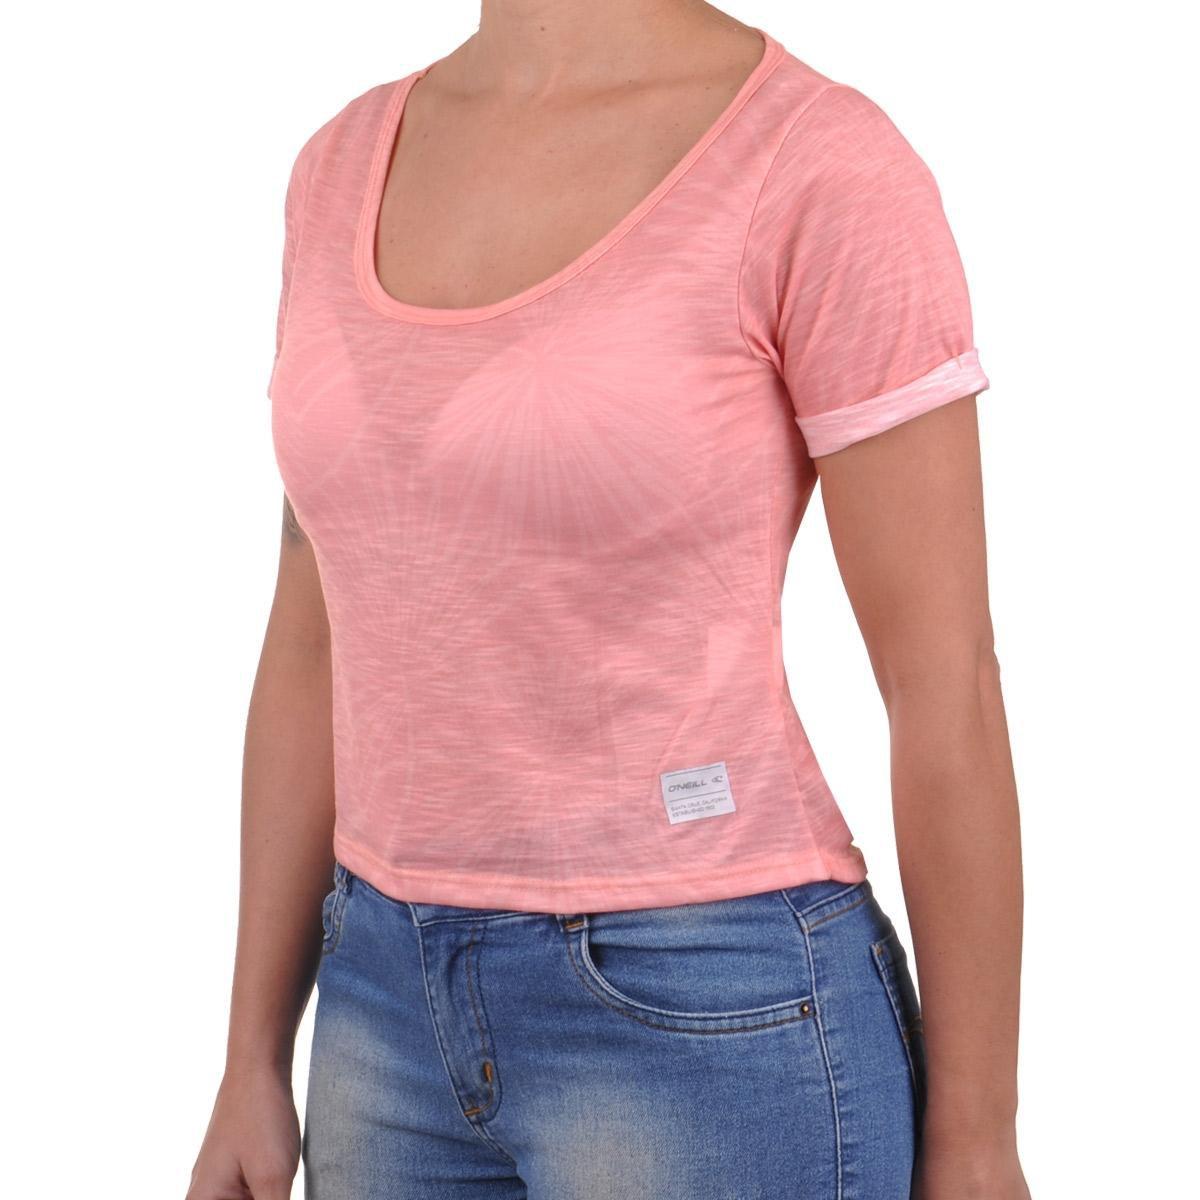 Oneill Feminino Rosa Palm Rosa Camiseta Palm Claro Cropped Claro Camiseta Cropped Feminino Oneill 8q1pFWw